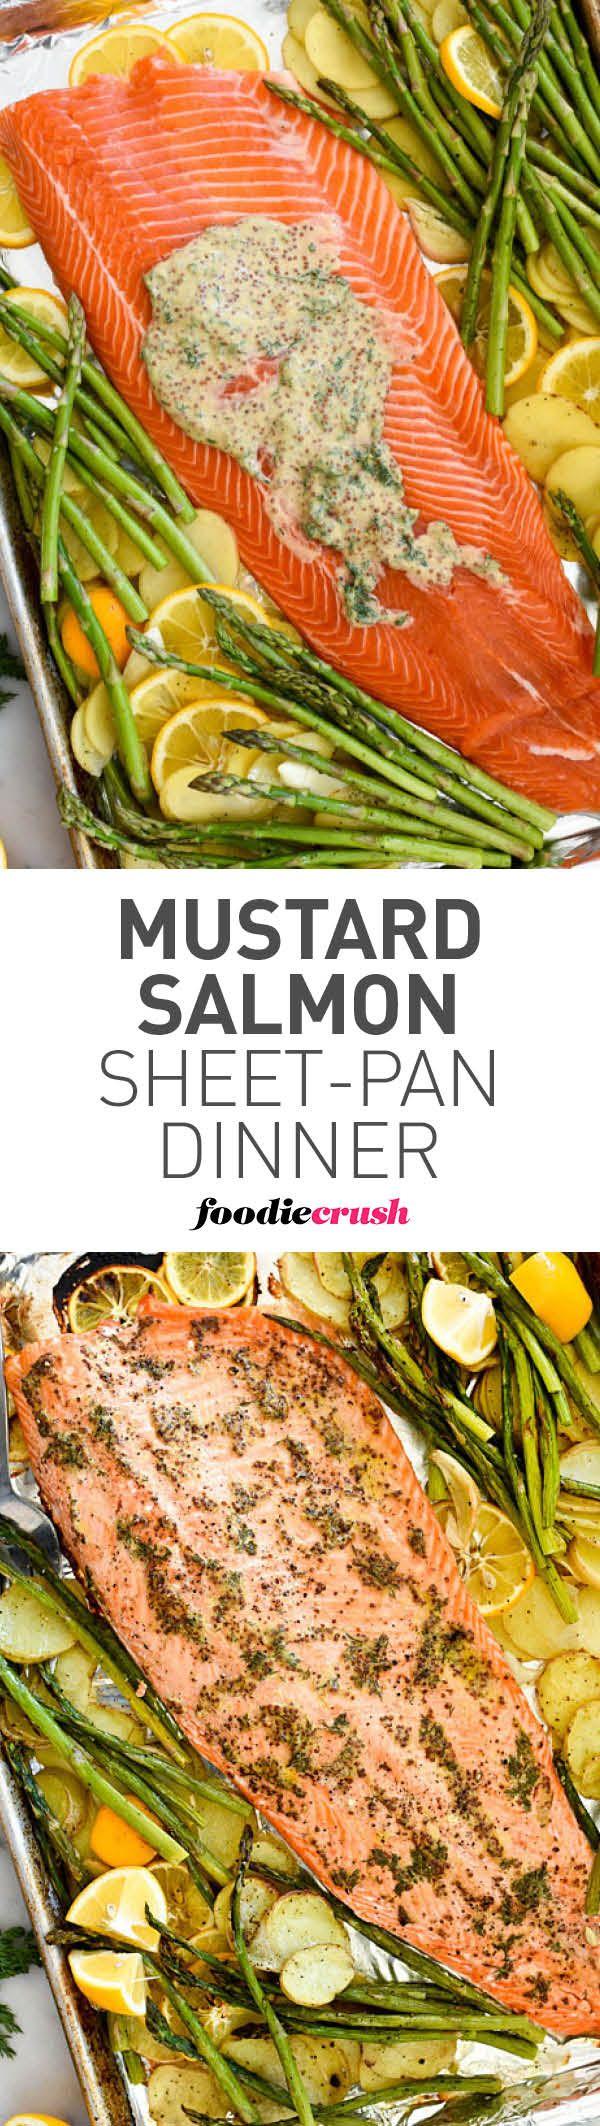 Mustard Salmon Sheet-Pan Dinner is a super simple dinner with minimal clean-up #salmon #shseetpan #fish #dinner | foodiecrush.com